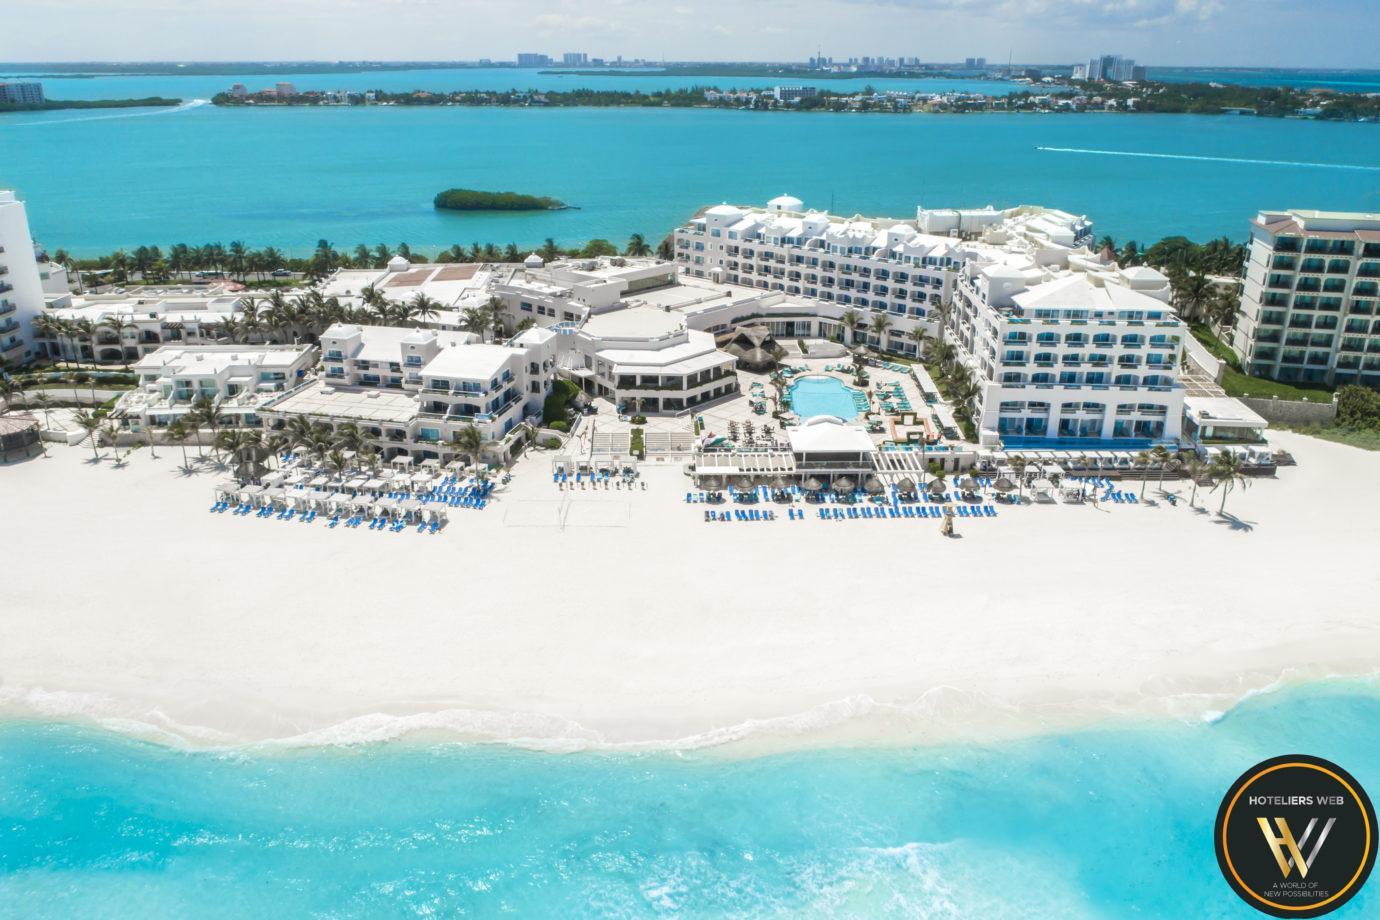 Upper Midscale All-Inclusive Resort Brand – Wyndham Alltra